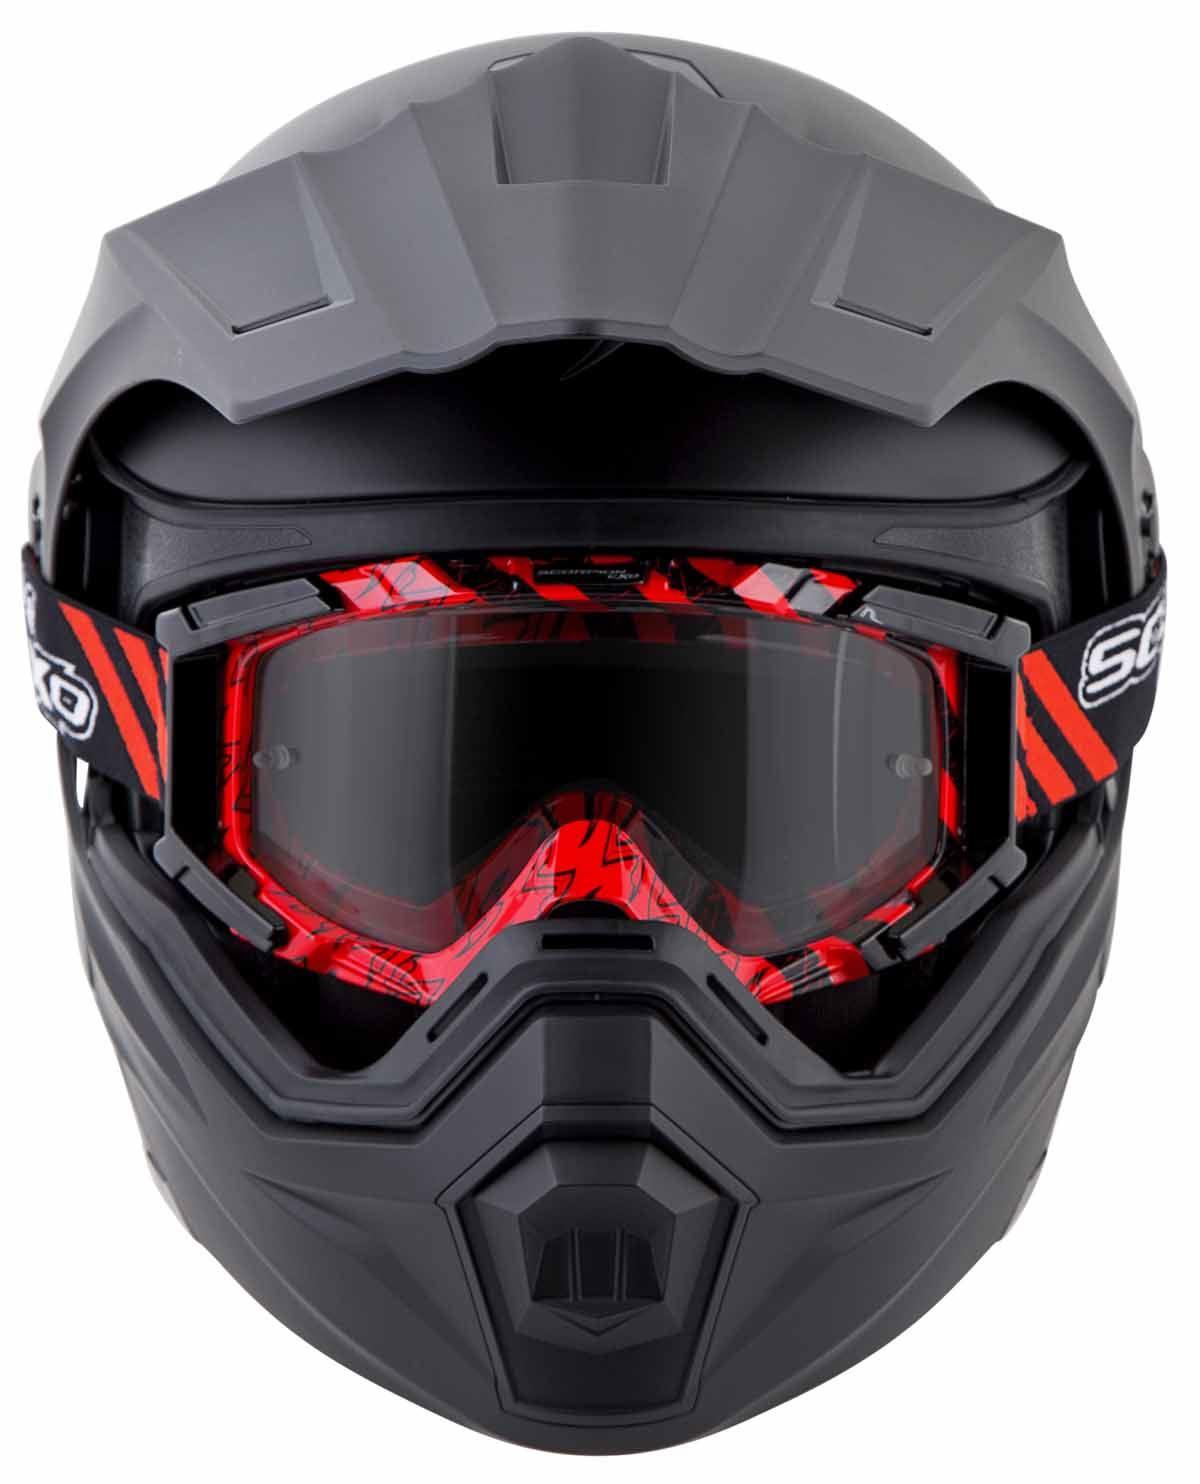 Scorpion-EXO-AT950-Helmet-Flip-Up-Modular-Dual-Sport-Adventure-ADV-DOT-XS-3XL miniature 5